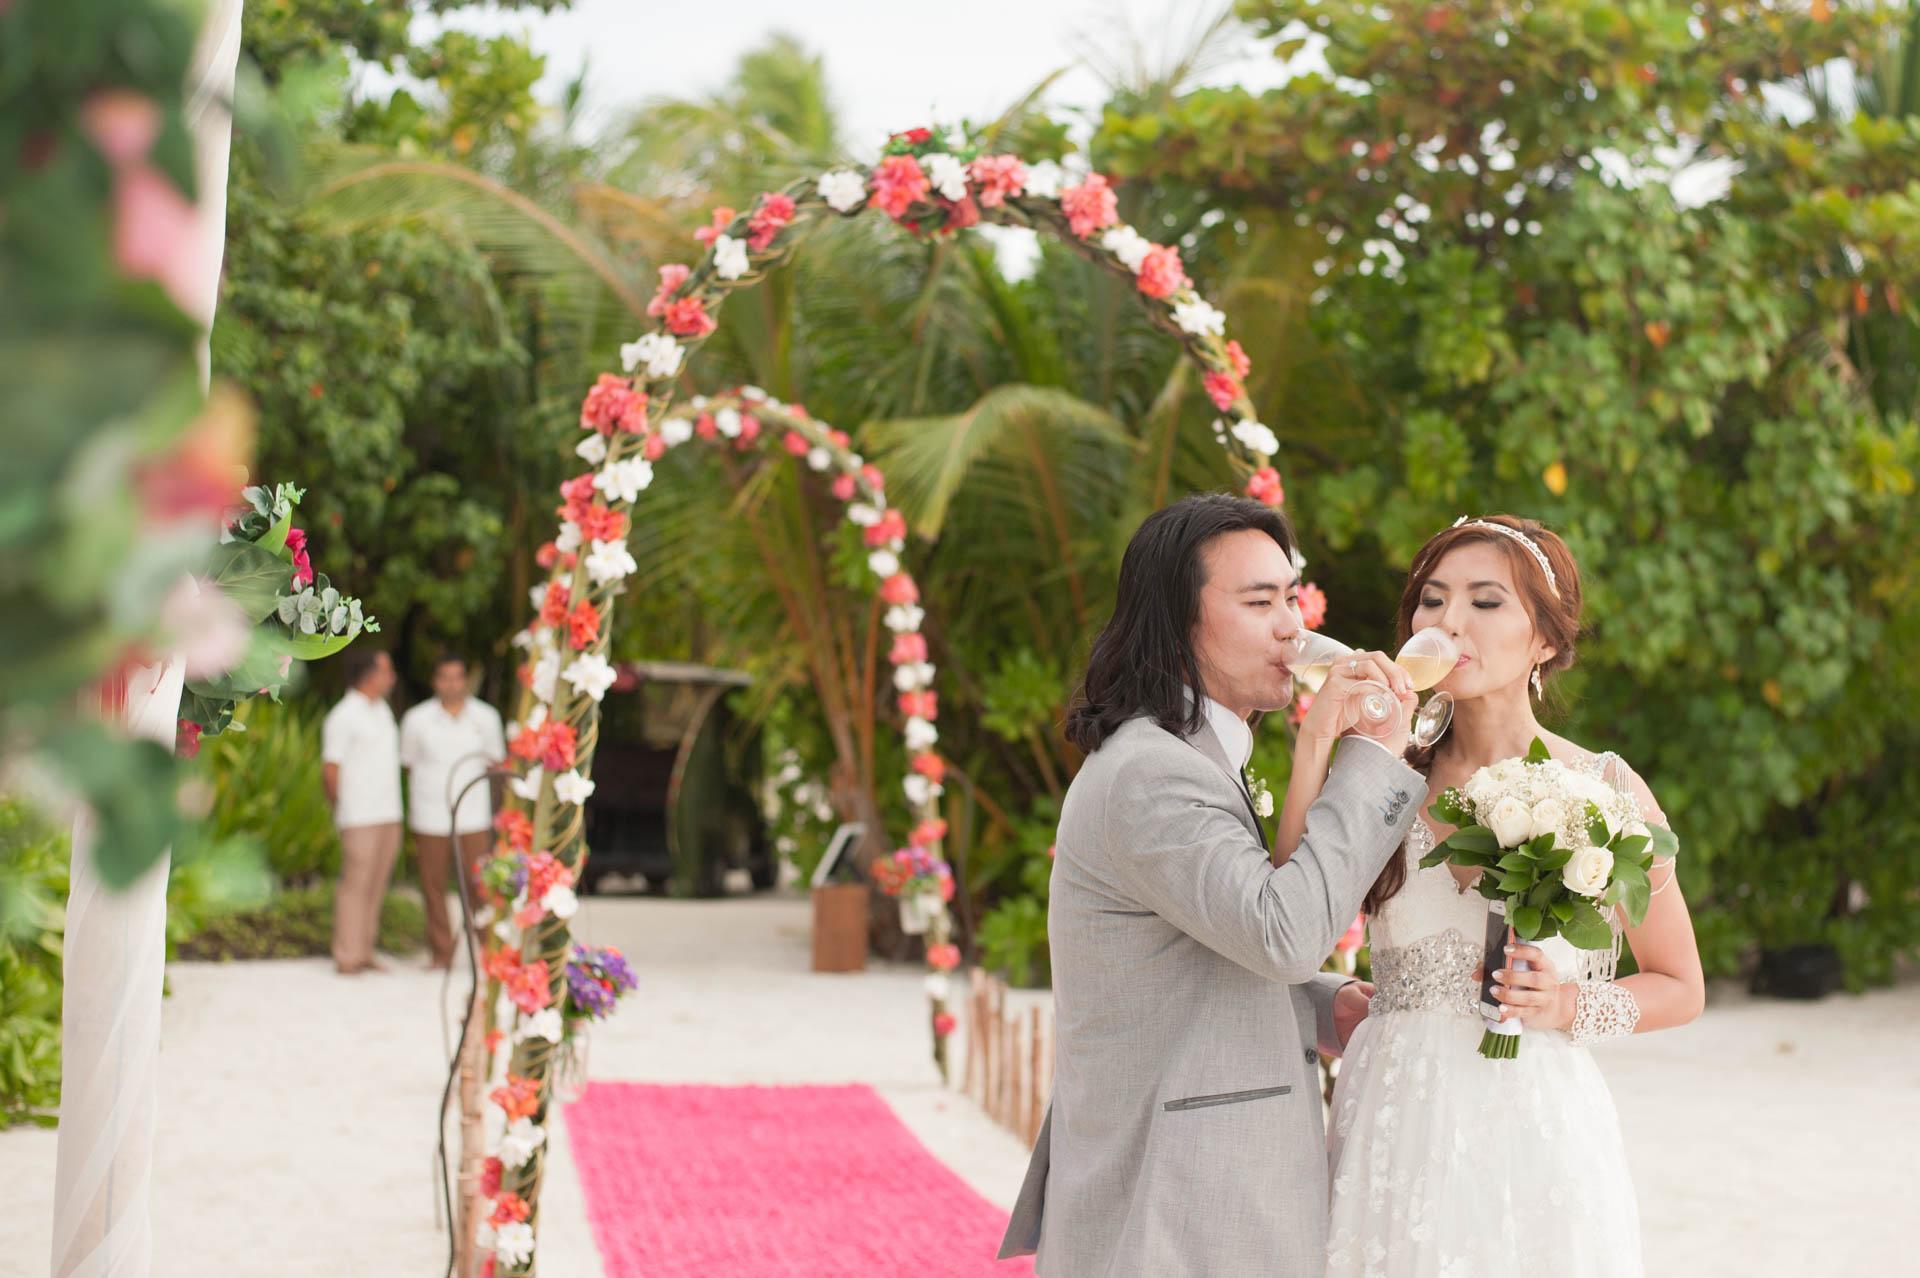 Chih Chao Yu Shan Destination Wedding at Residence Maldives 25